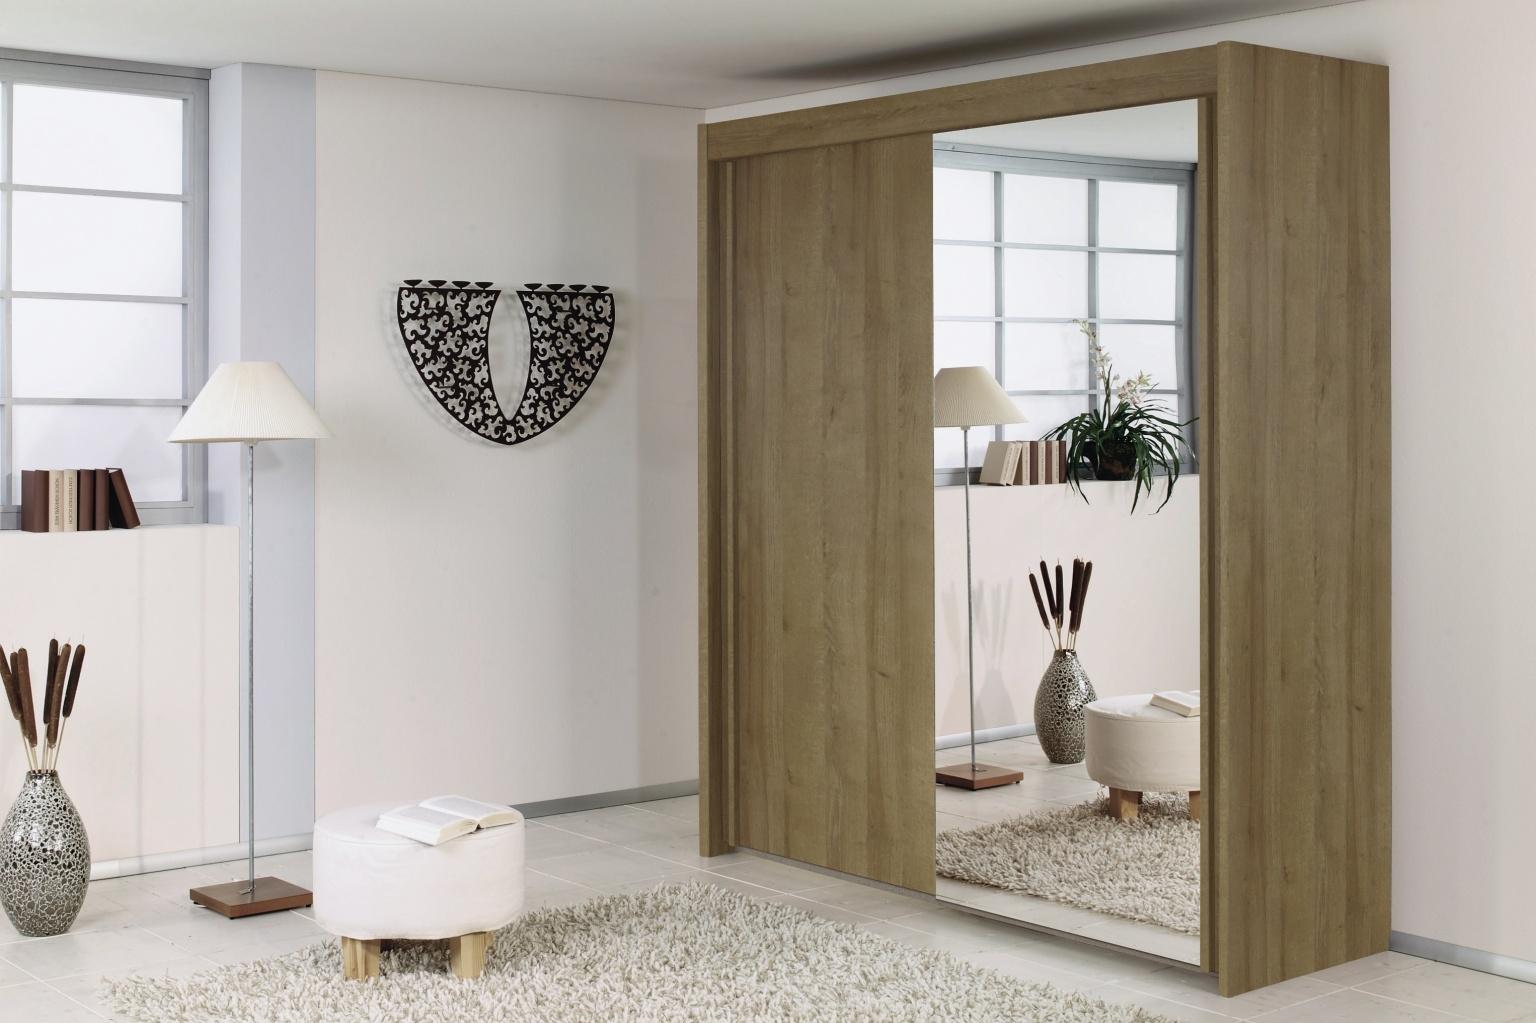 Rauch Imperial Rivera Oak 2 Door Sliding Wardrobe W 151cm